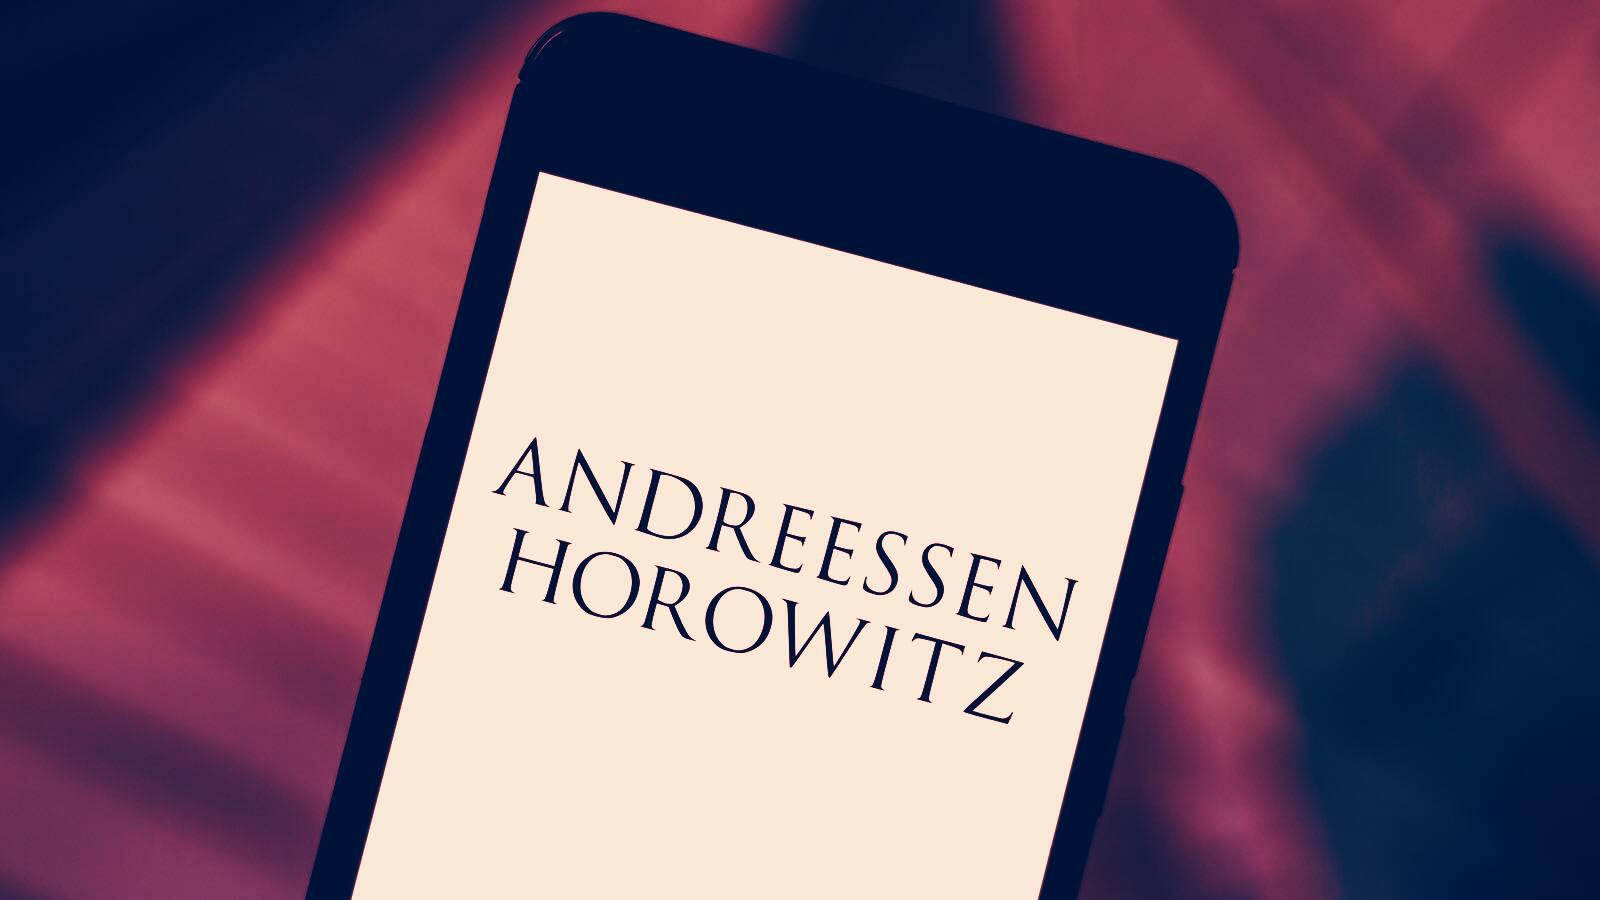 Andreessen Horowitz Raises Mega $2.2 Billion Crypto Fund, Hires Prominent SEC Veteran Hinman